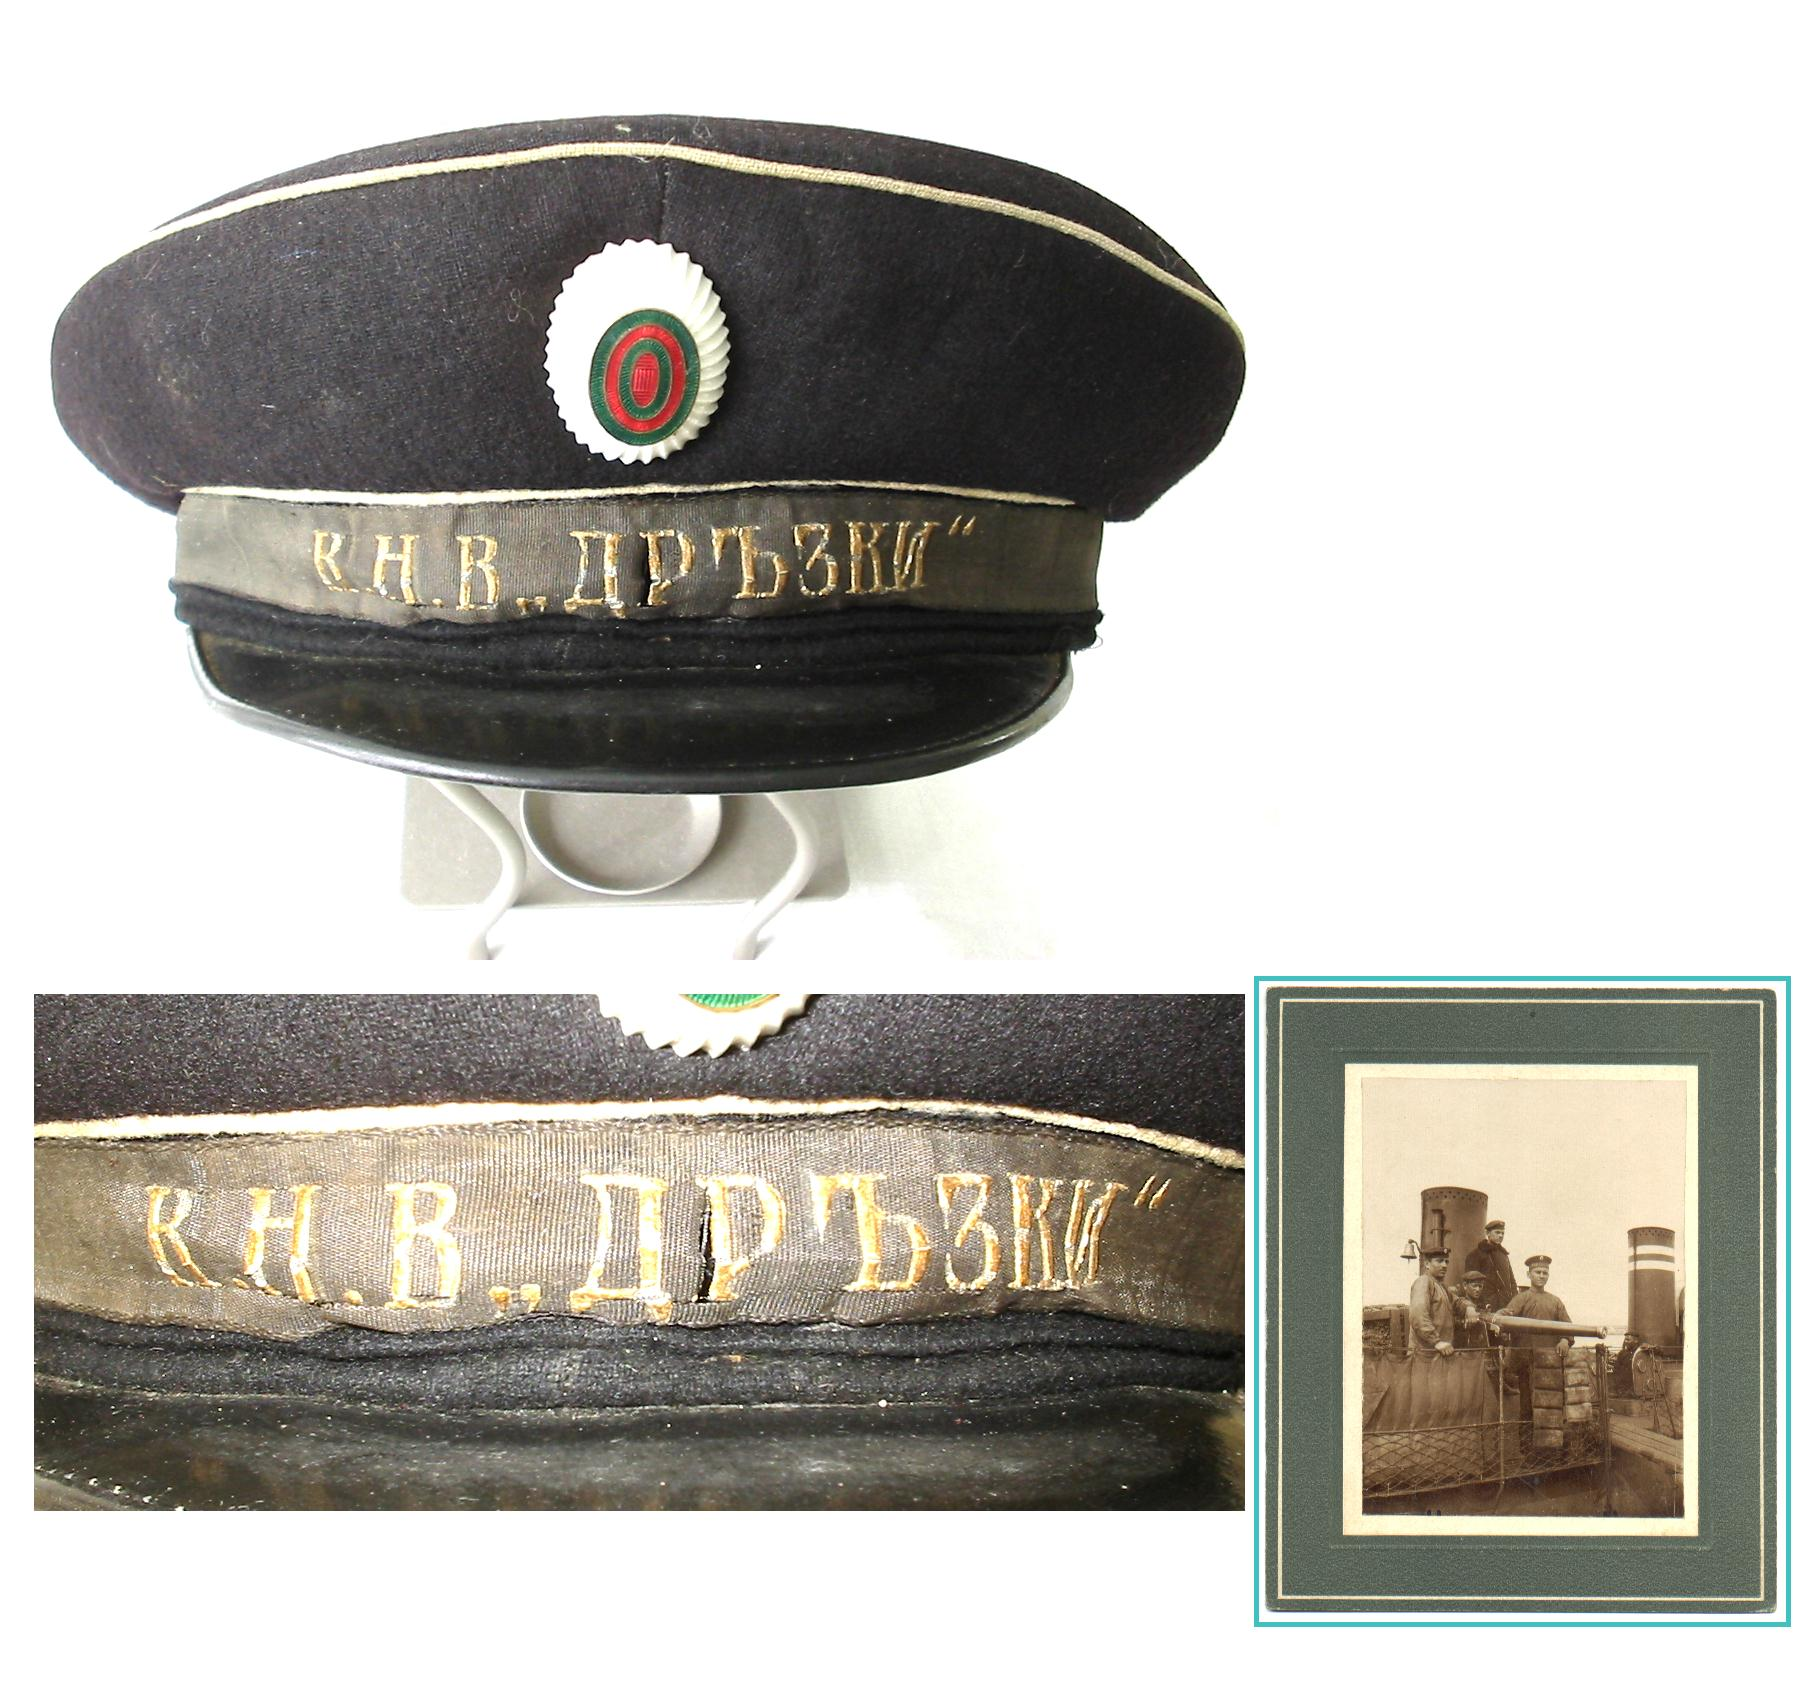 Recently Sold Items Listing WWI Bulgaria Torpedo Boat DRAZKI